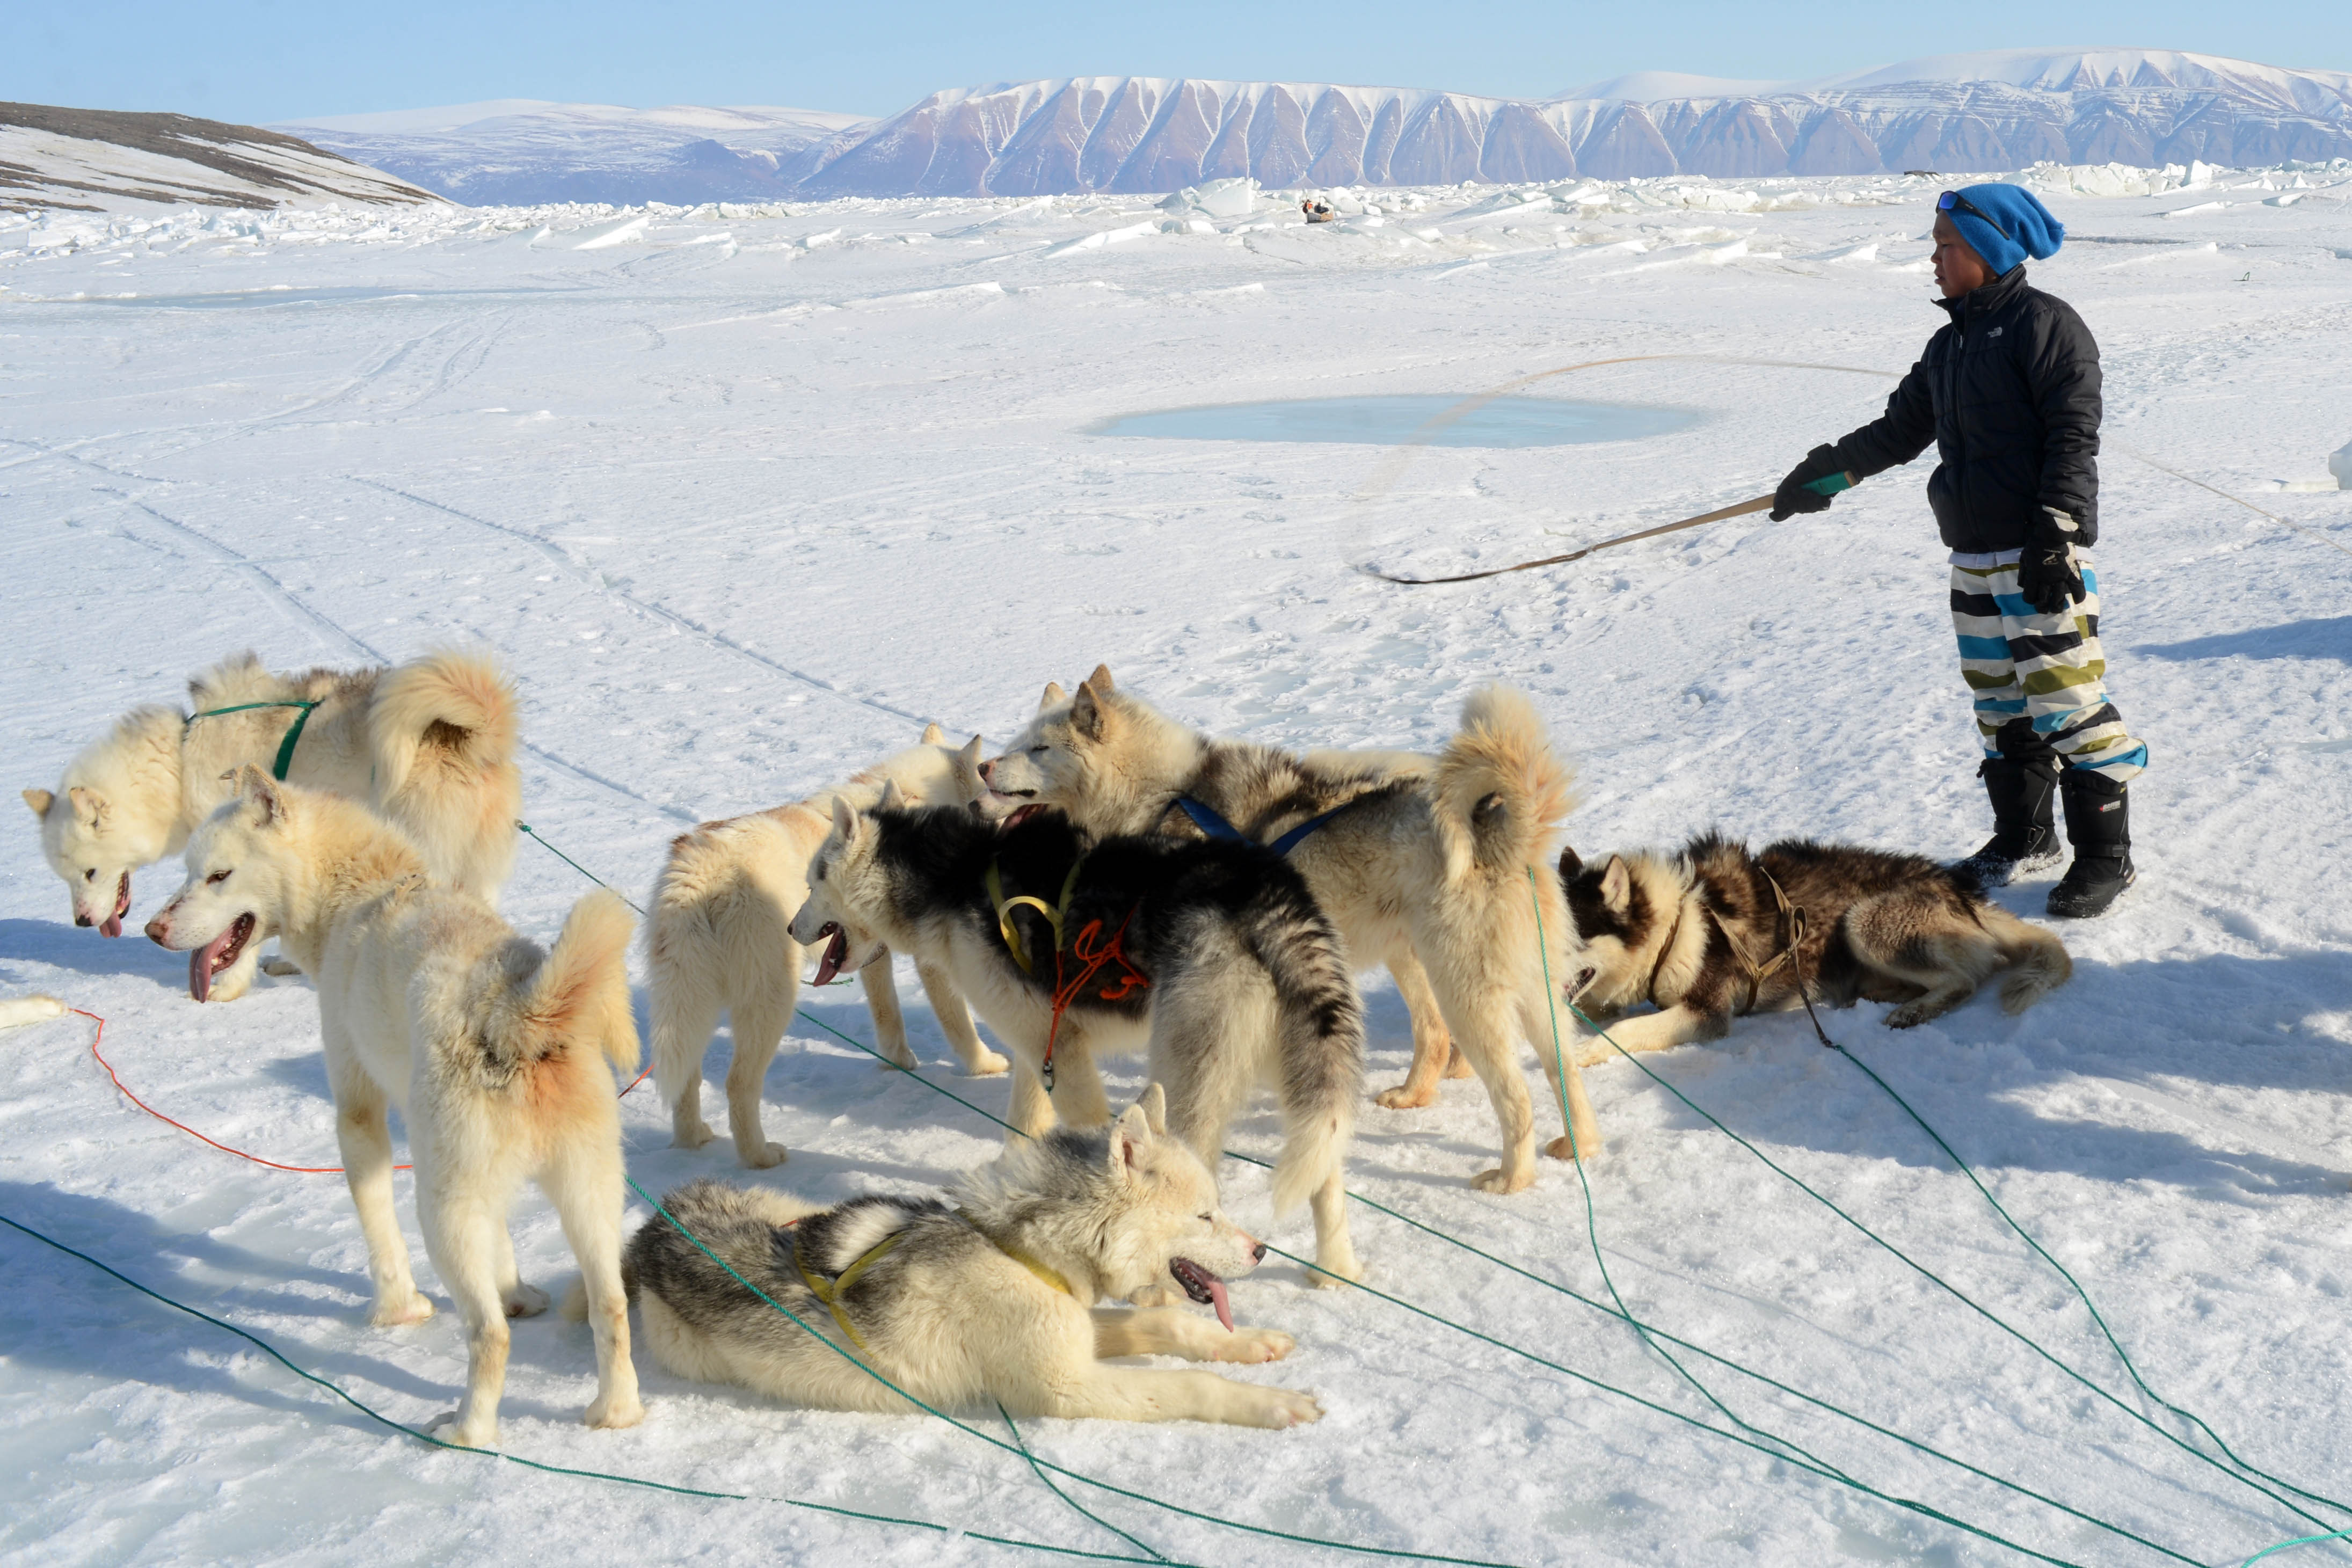 on thin ice inuit way of life vanishing in arctic nbc news